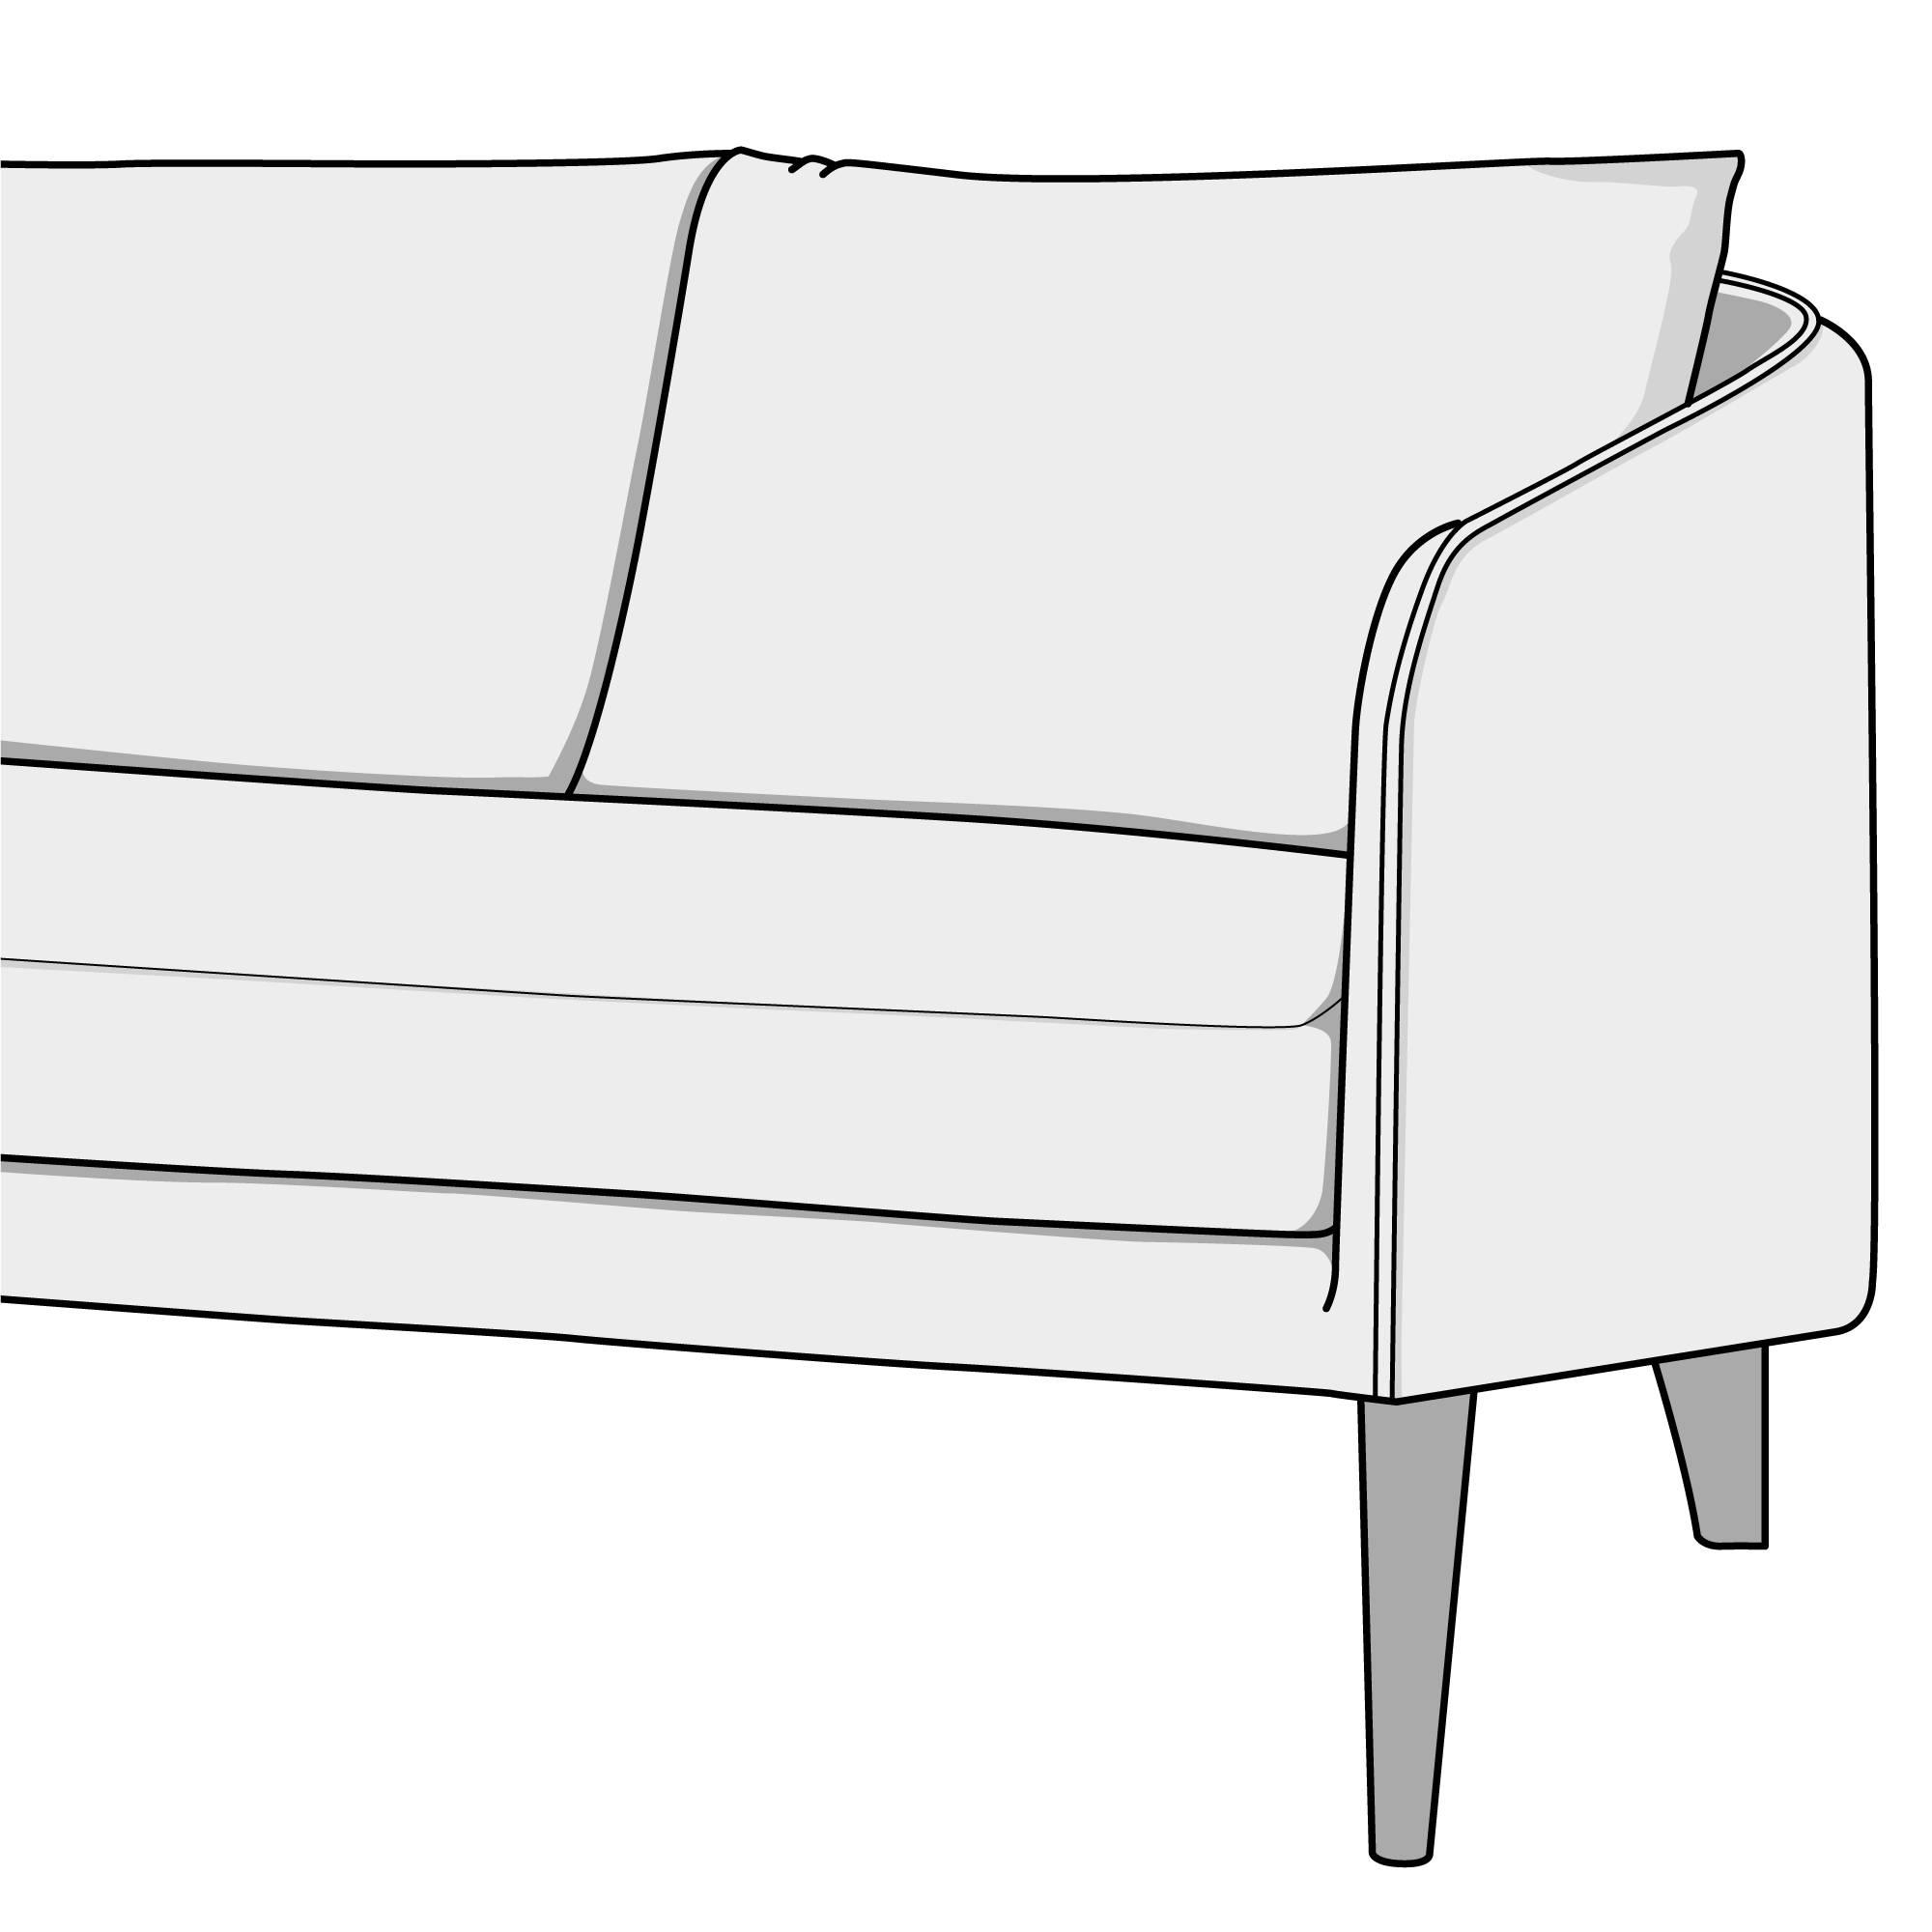 Types Of Sofa Cushions Sofa Seats Sofa Guide Luxdeco Com